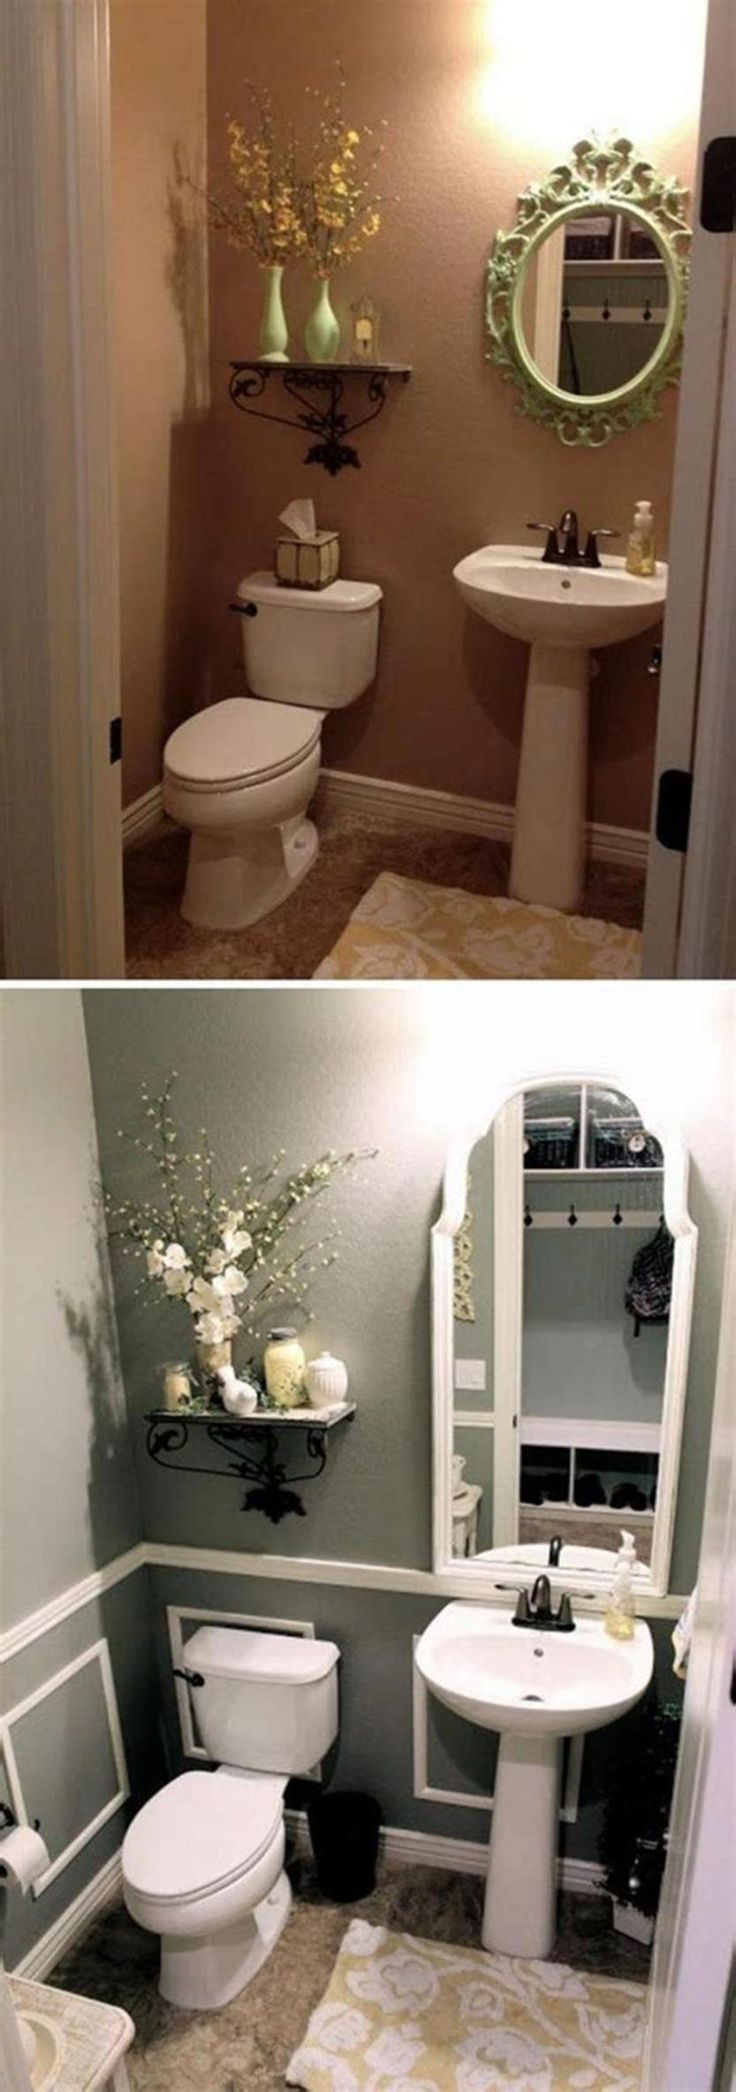 40 Most Popular Half Bathroom Decor Ideas 2019 | Diy ...